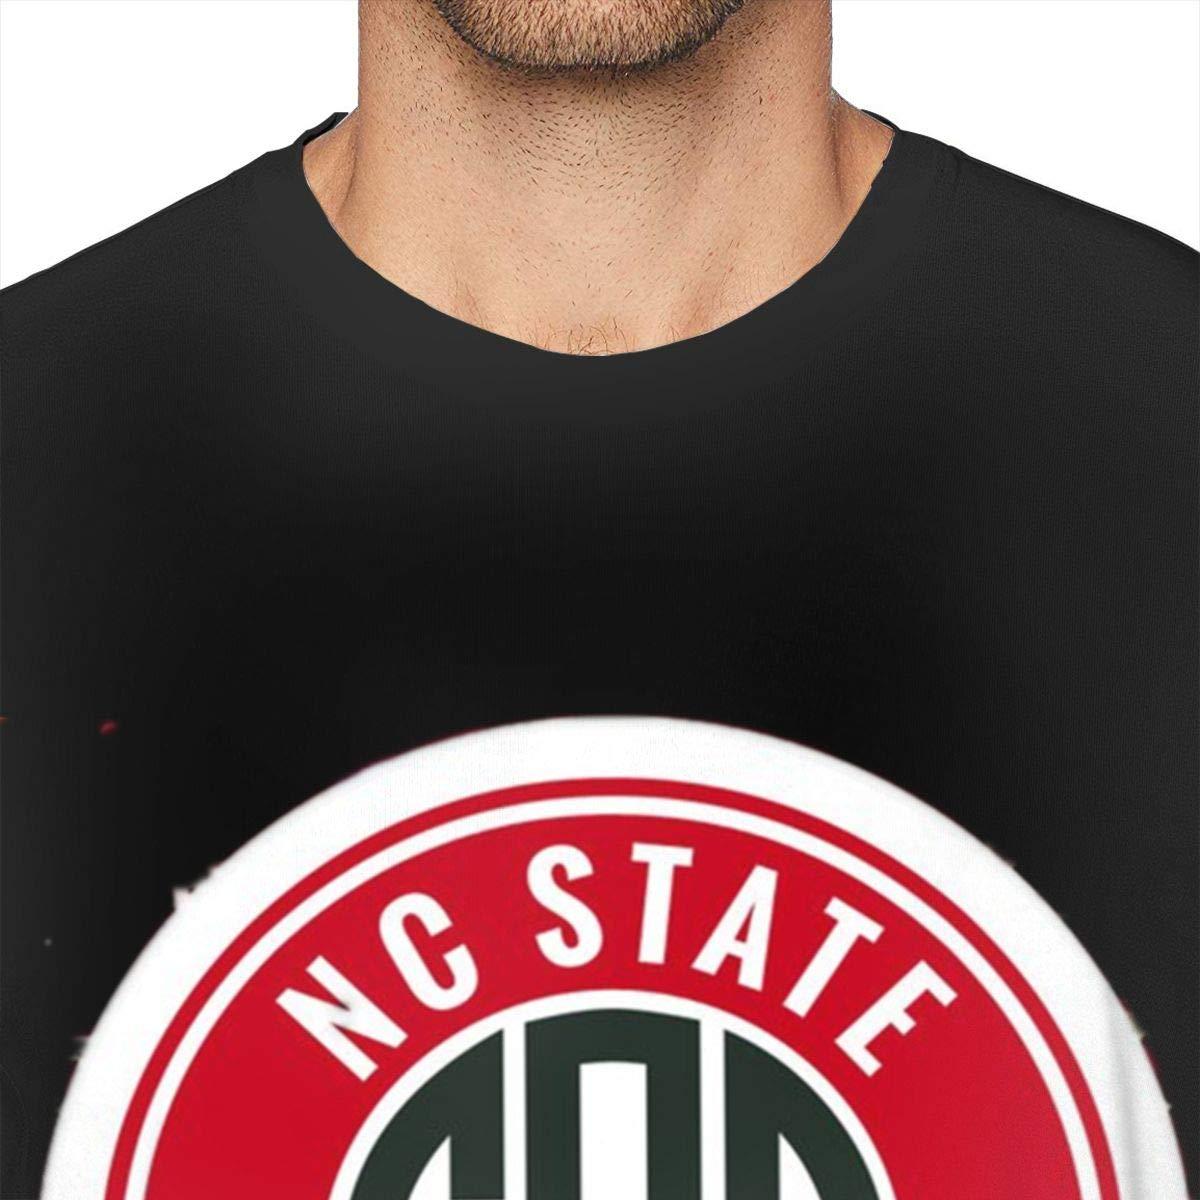 BODATU Mens Design with NC North Carolina A/&T State Universi Fashion Shirt